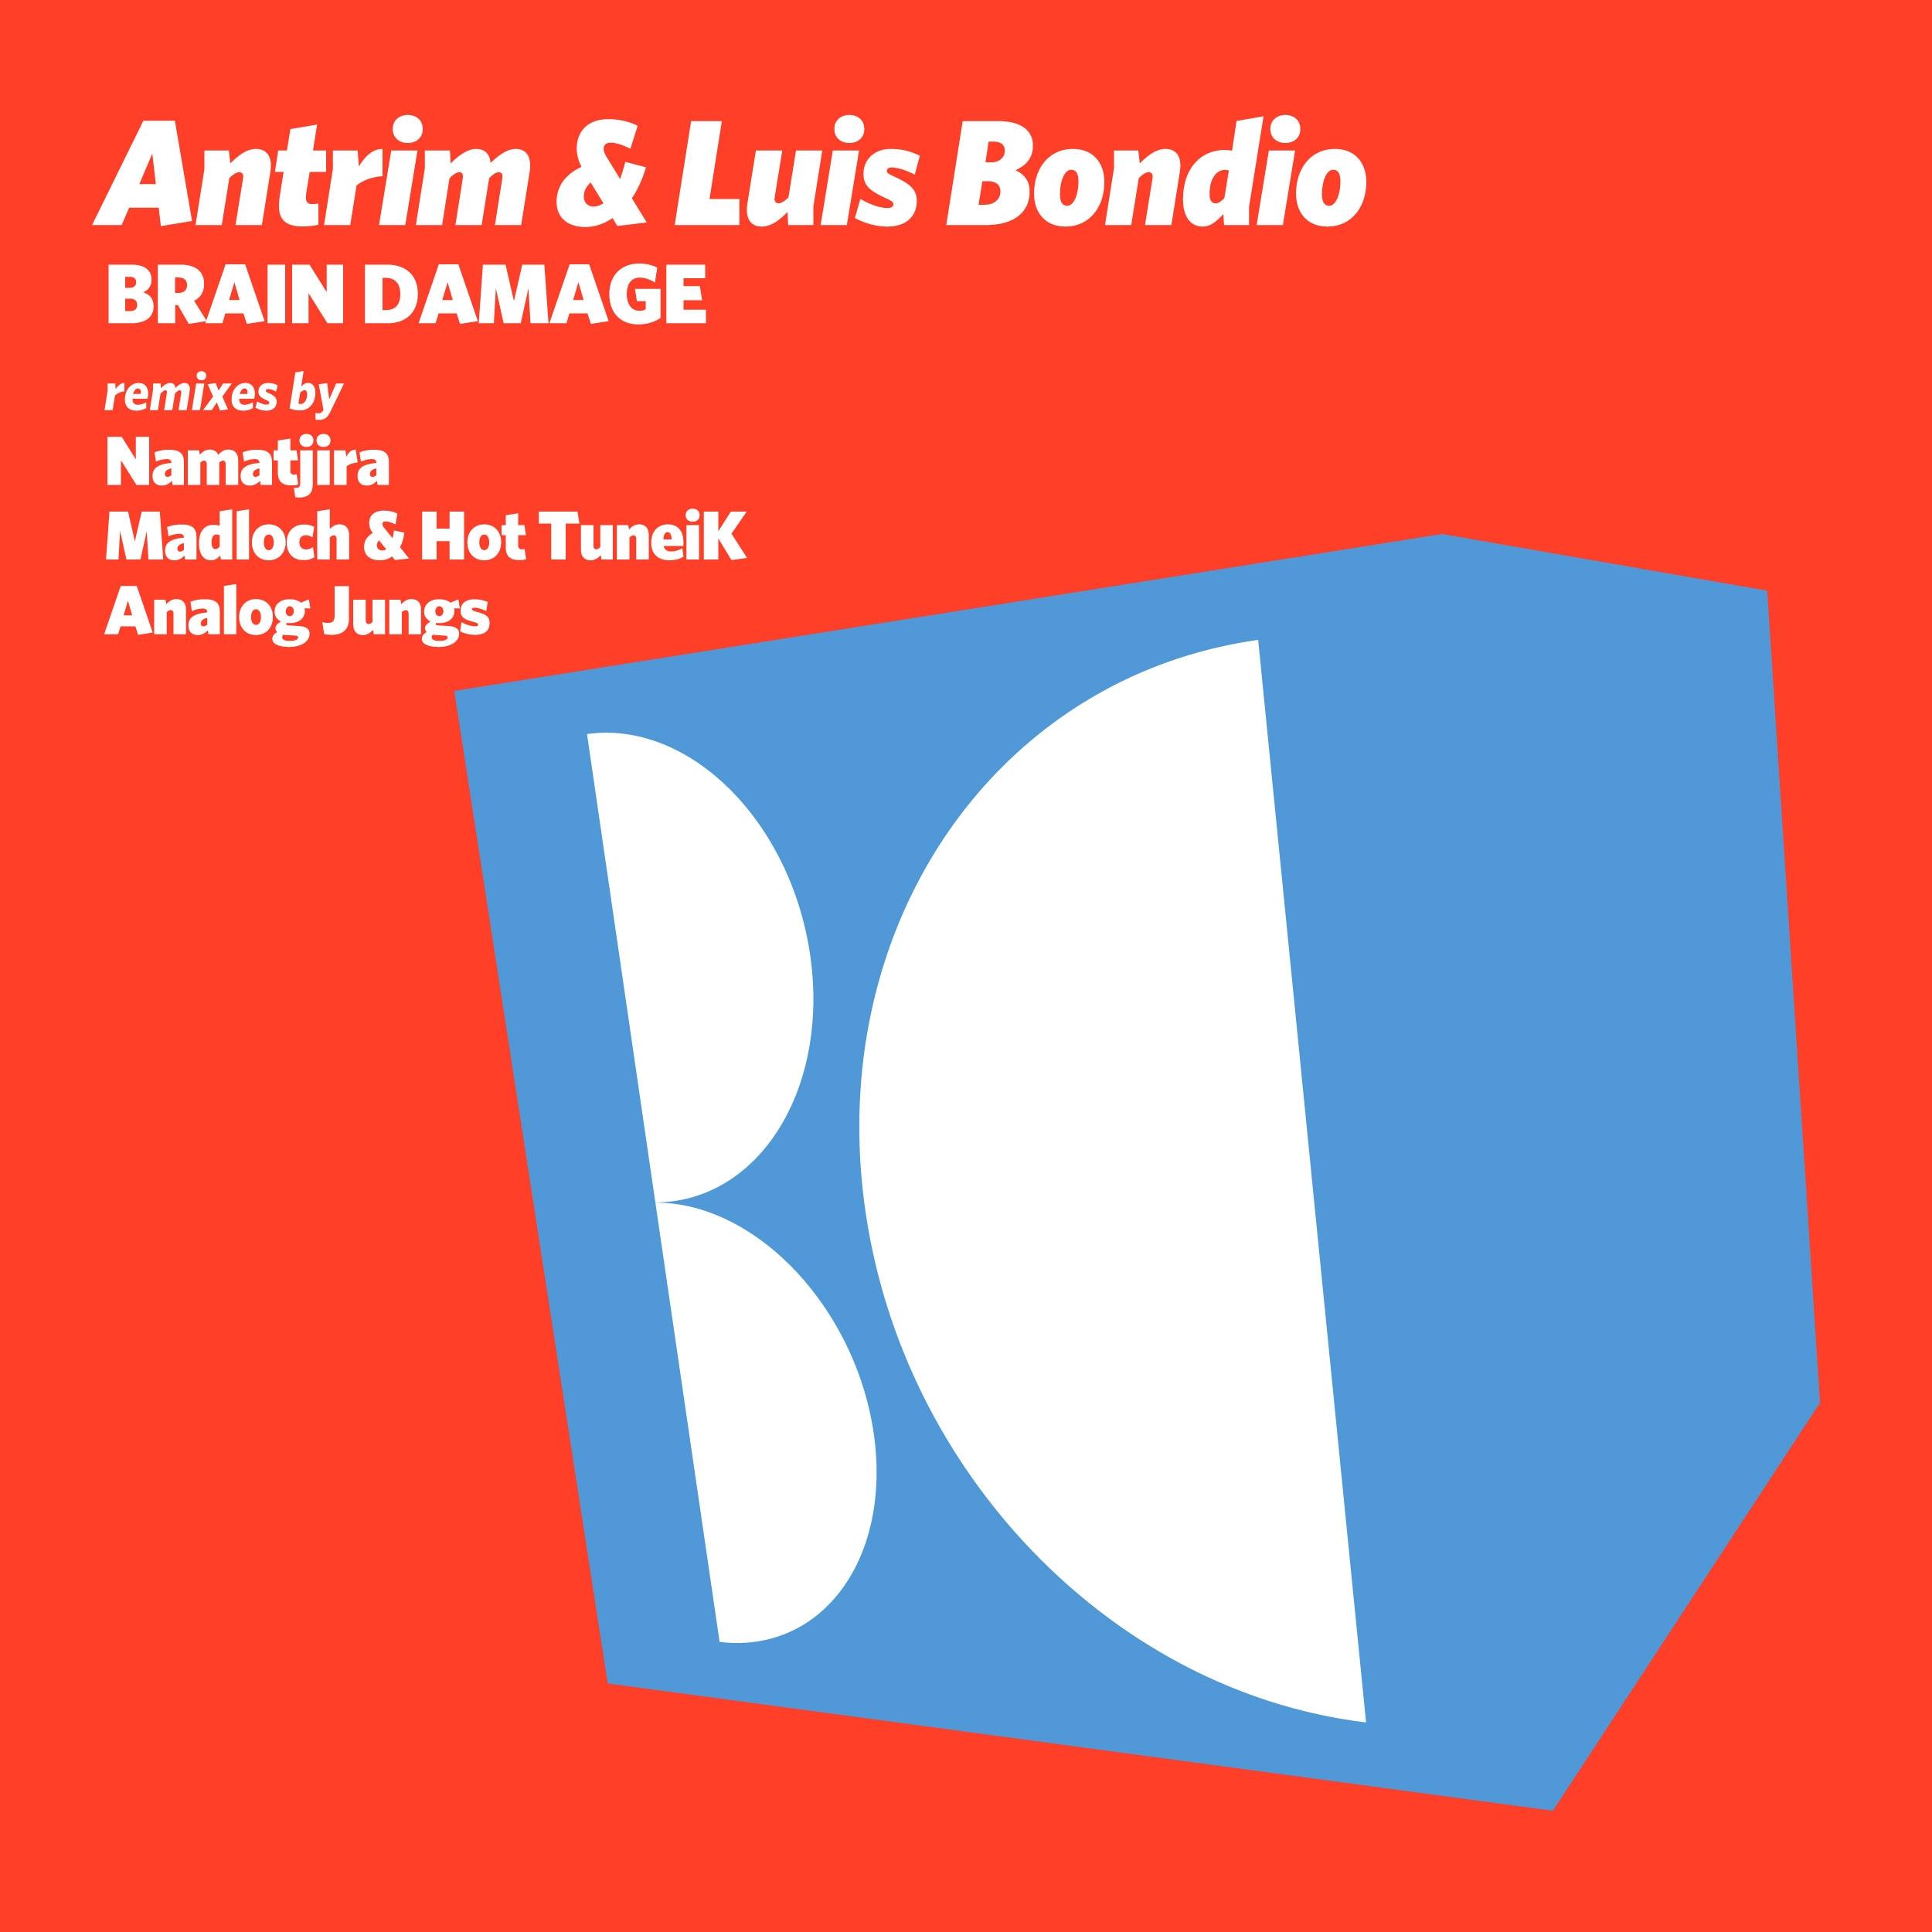 Antrim and Luis Bondio - Brain Damage